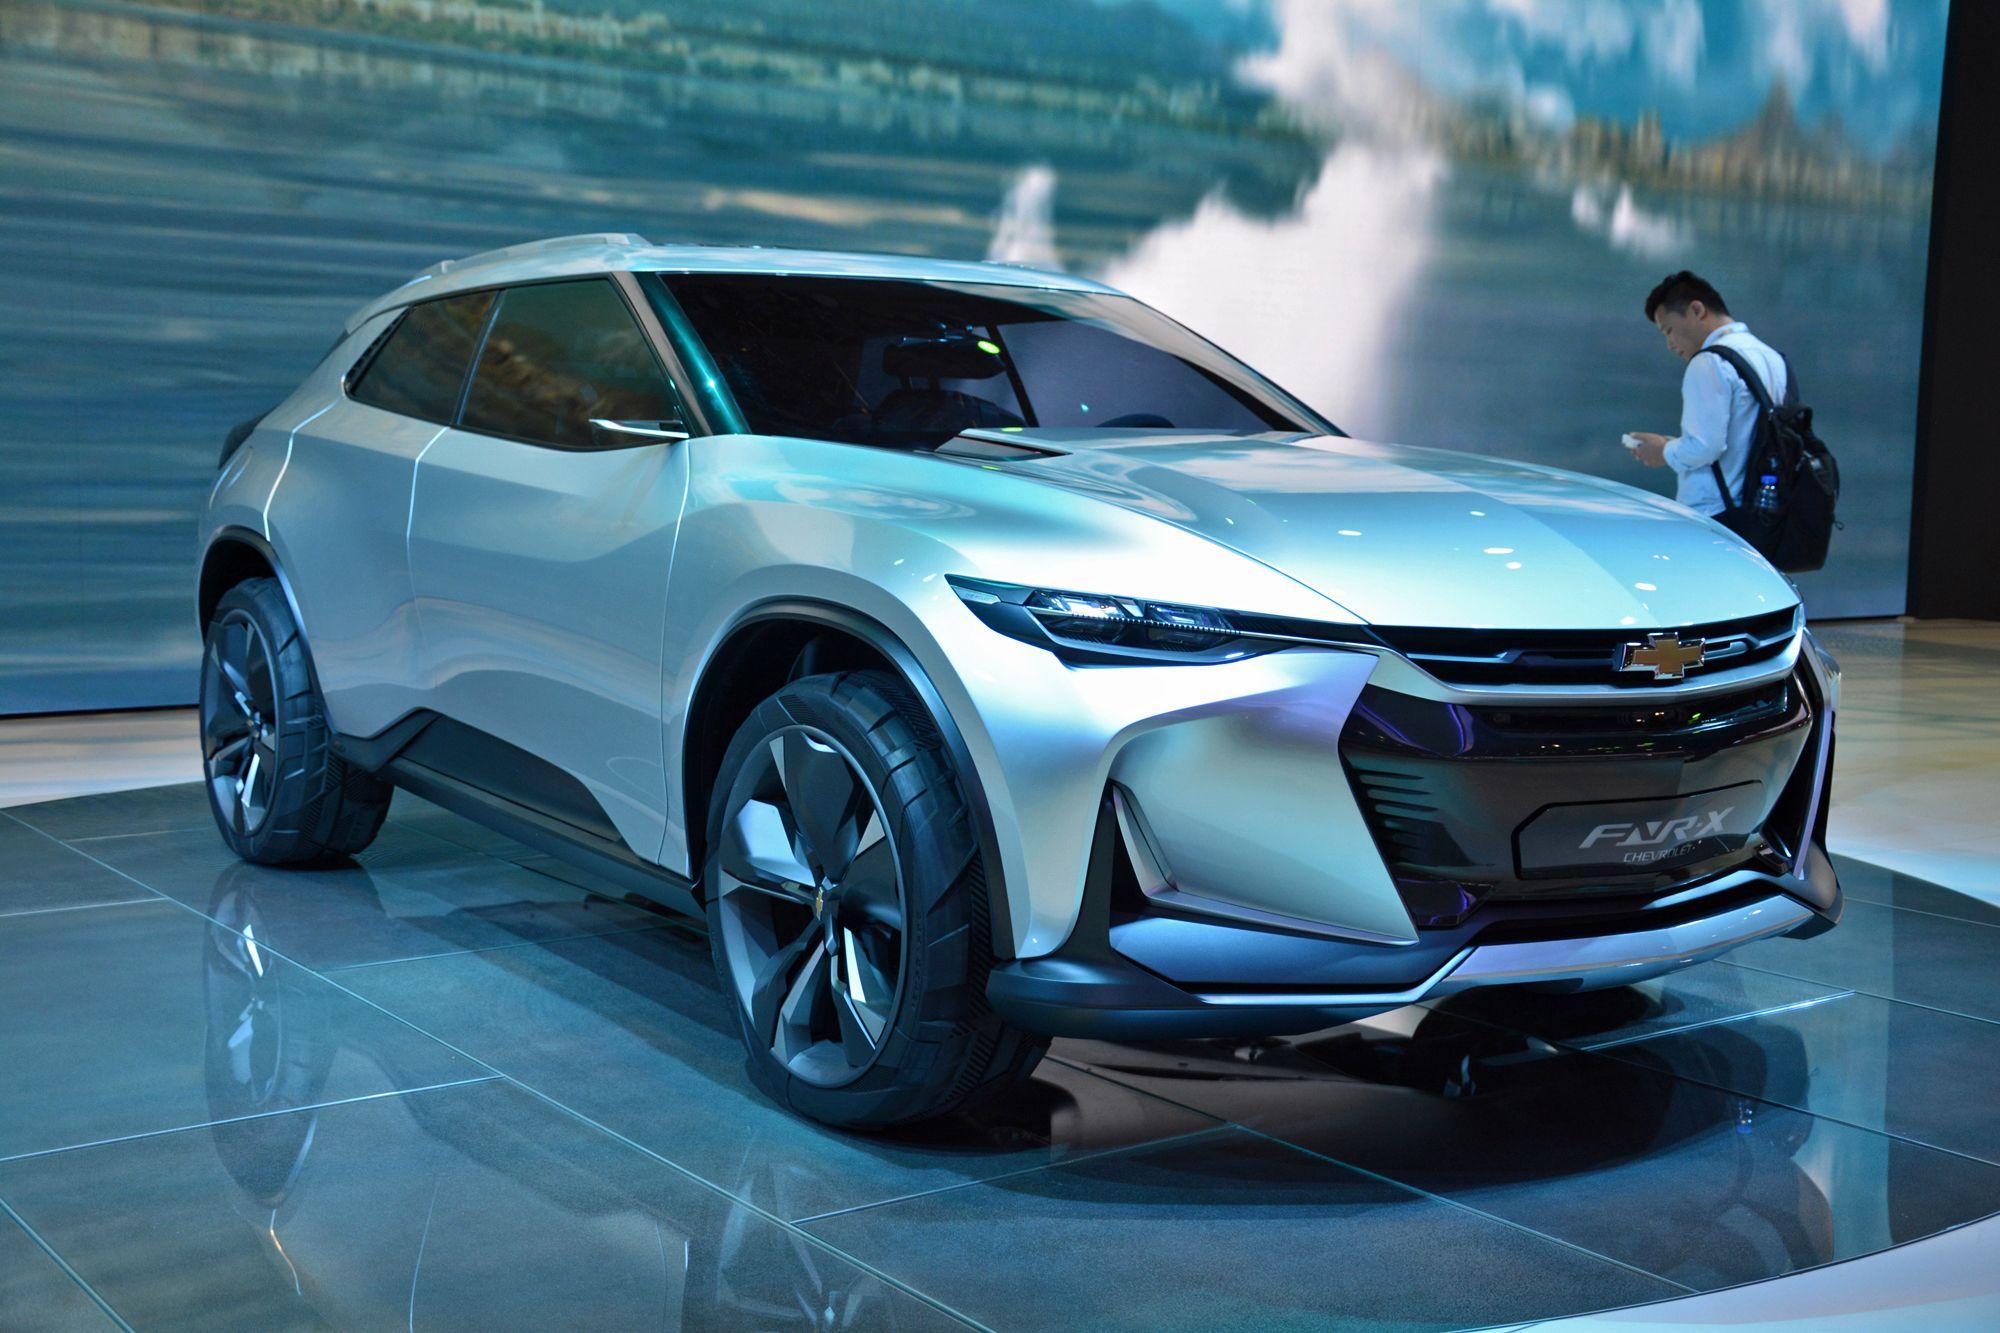 Chevrolet Fnr X Plug In Hybrid Crossover Concept Debuts In